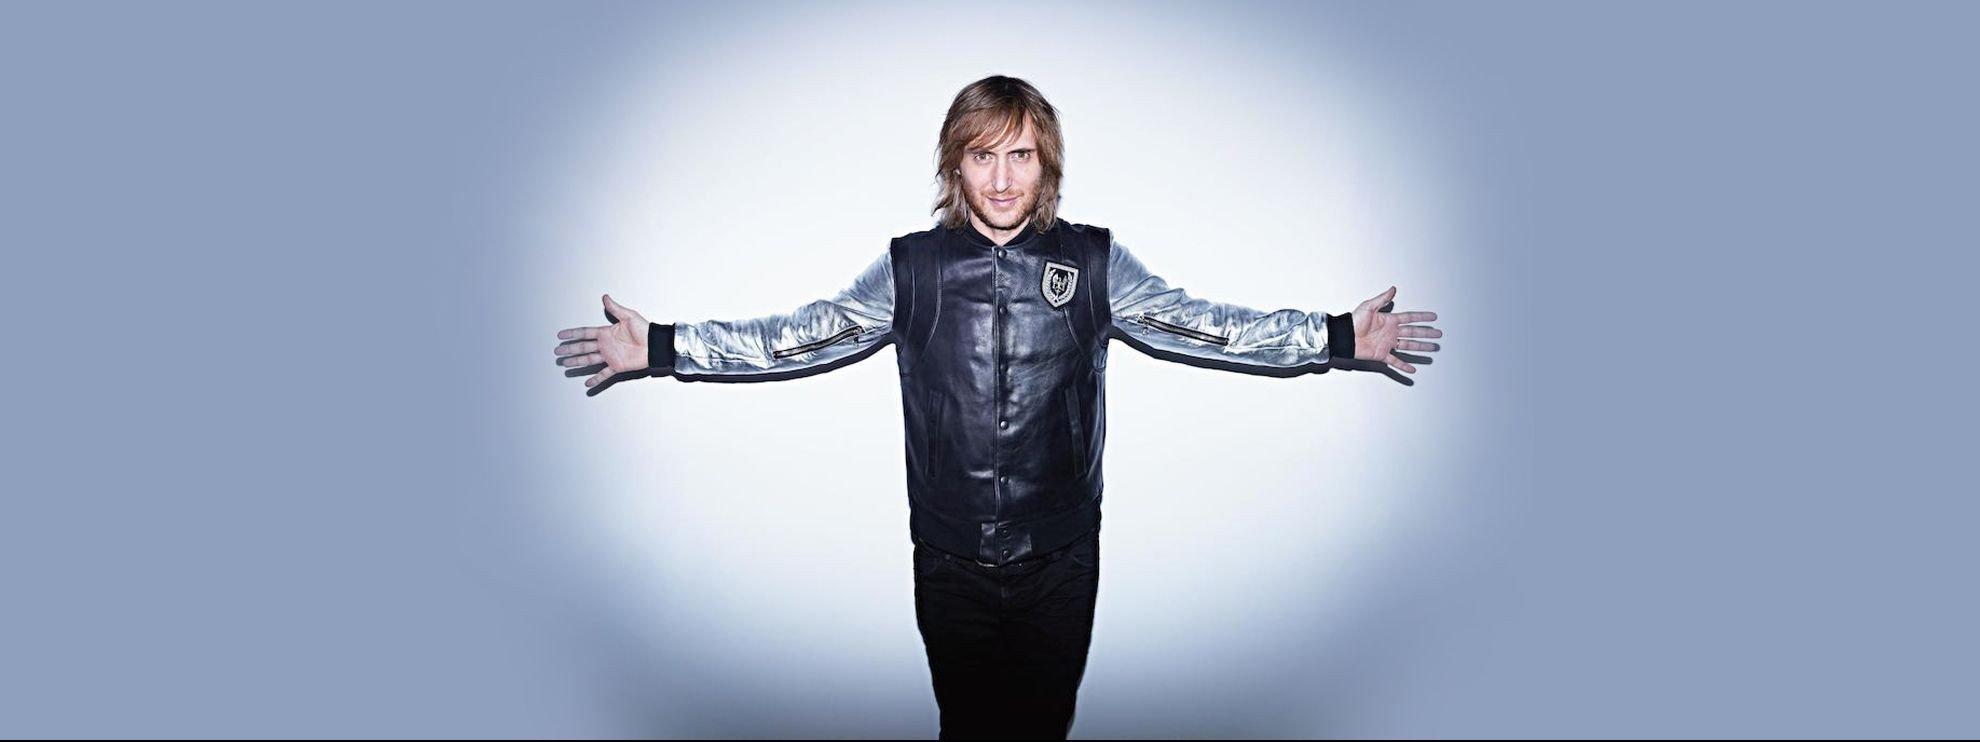 событие David Guetta (Дэвид Гетта)